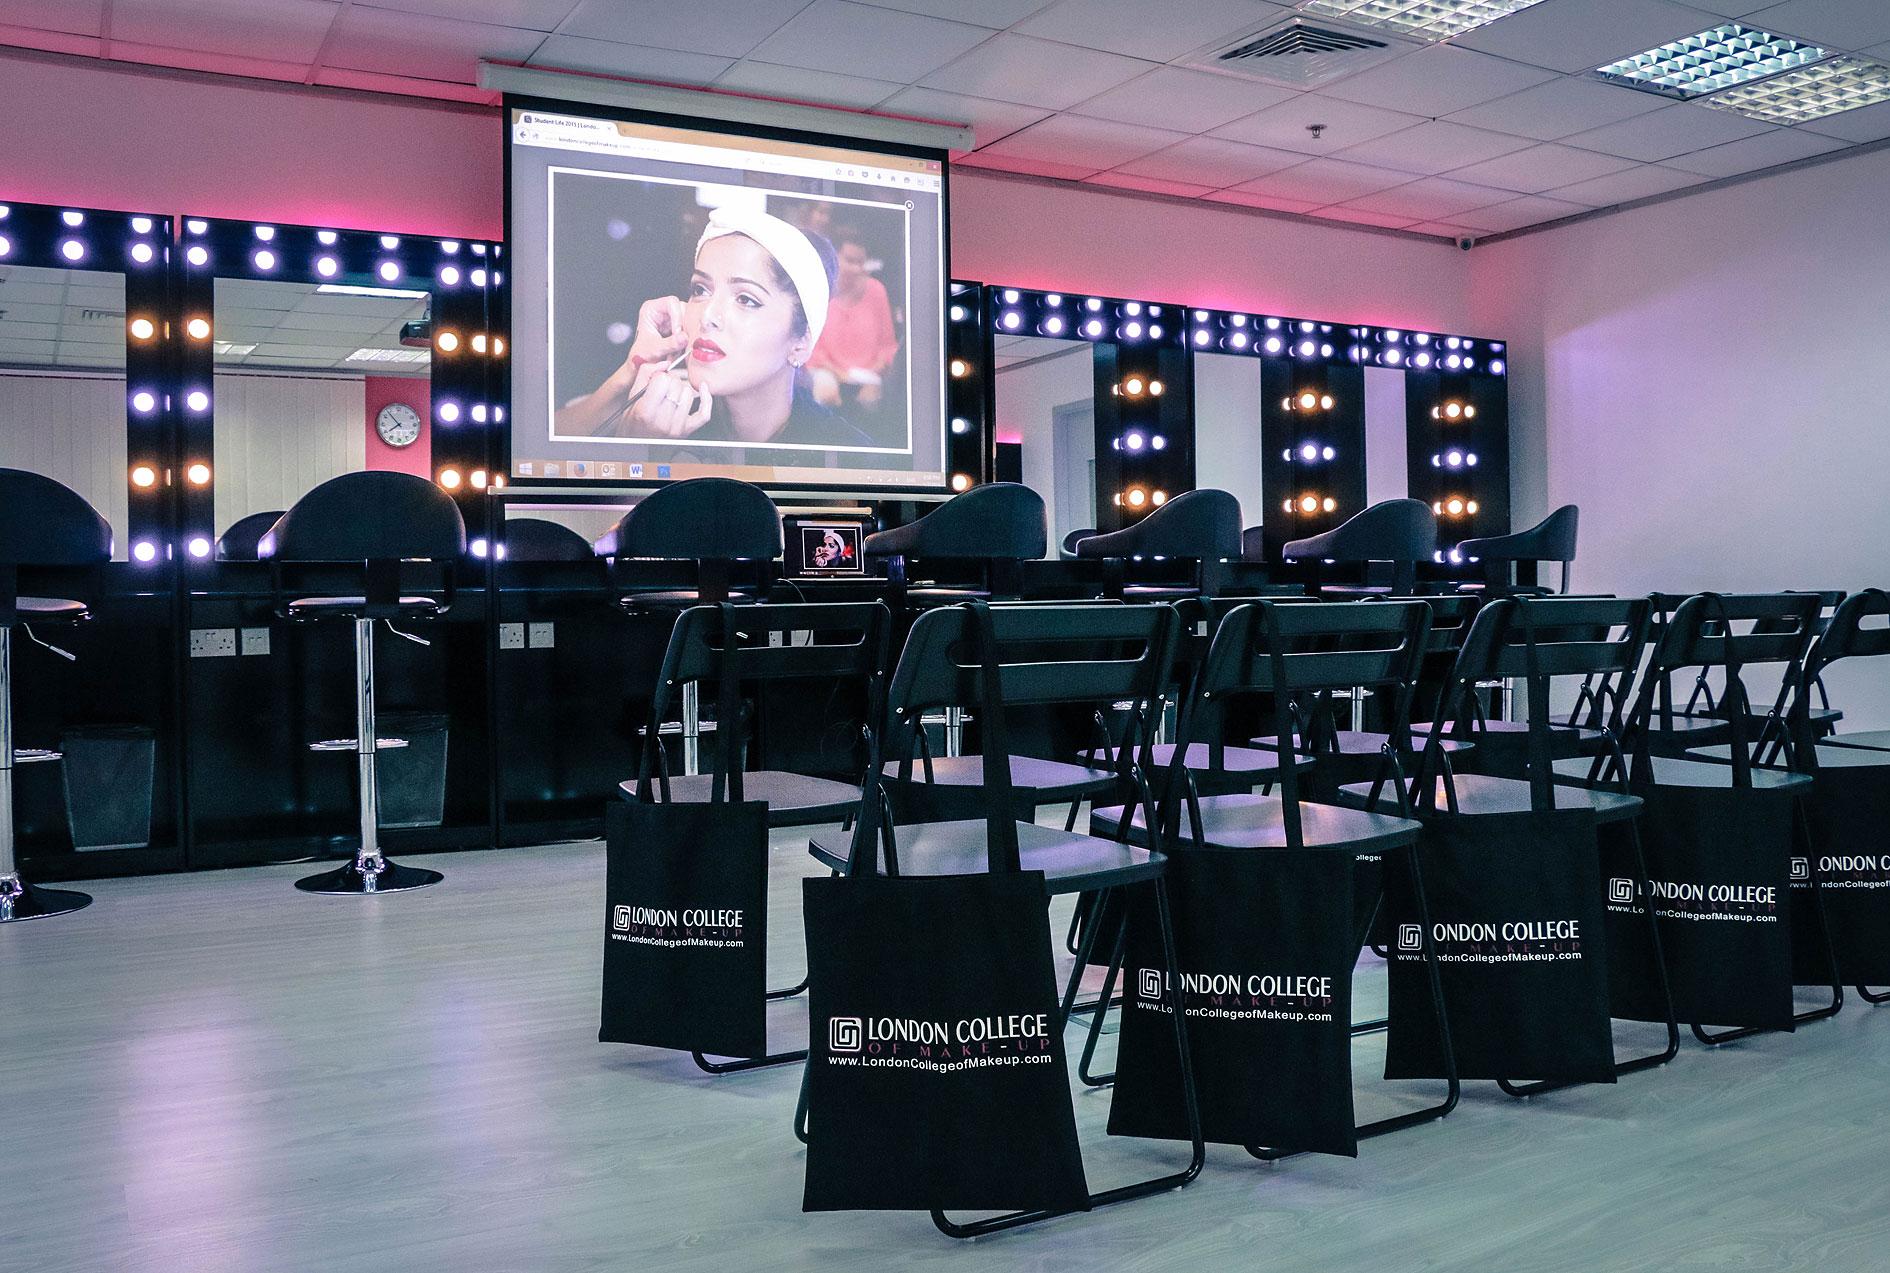 Emirates News Agency Expo 2020 Dubai